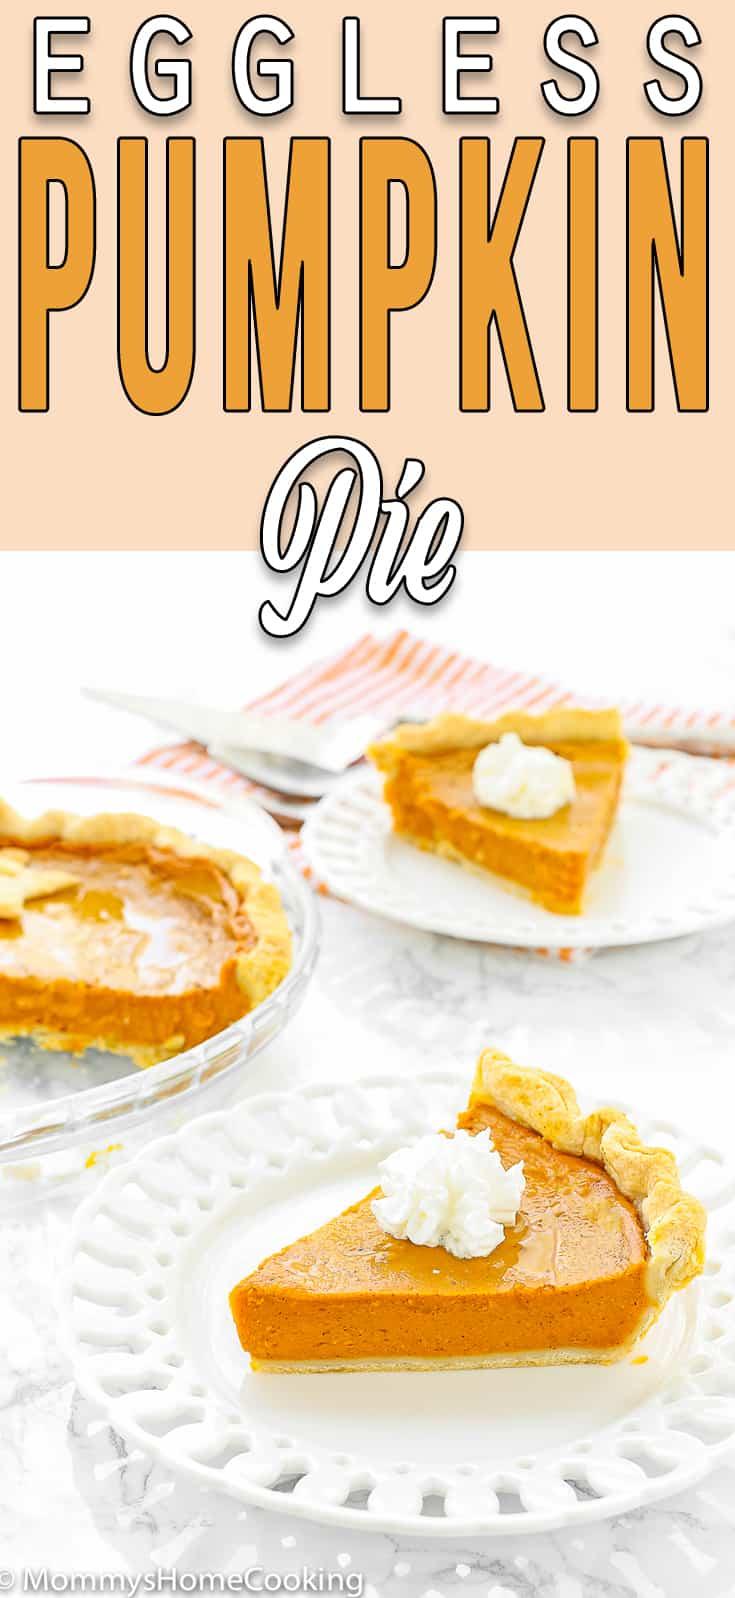 eggless pumpkin pie slices with descriptive text